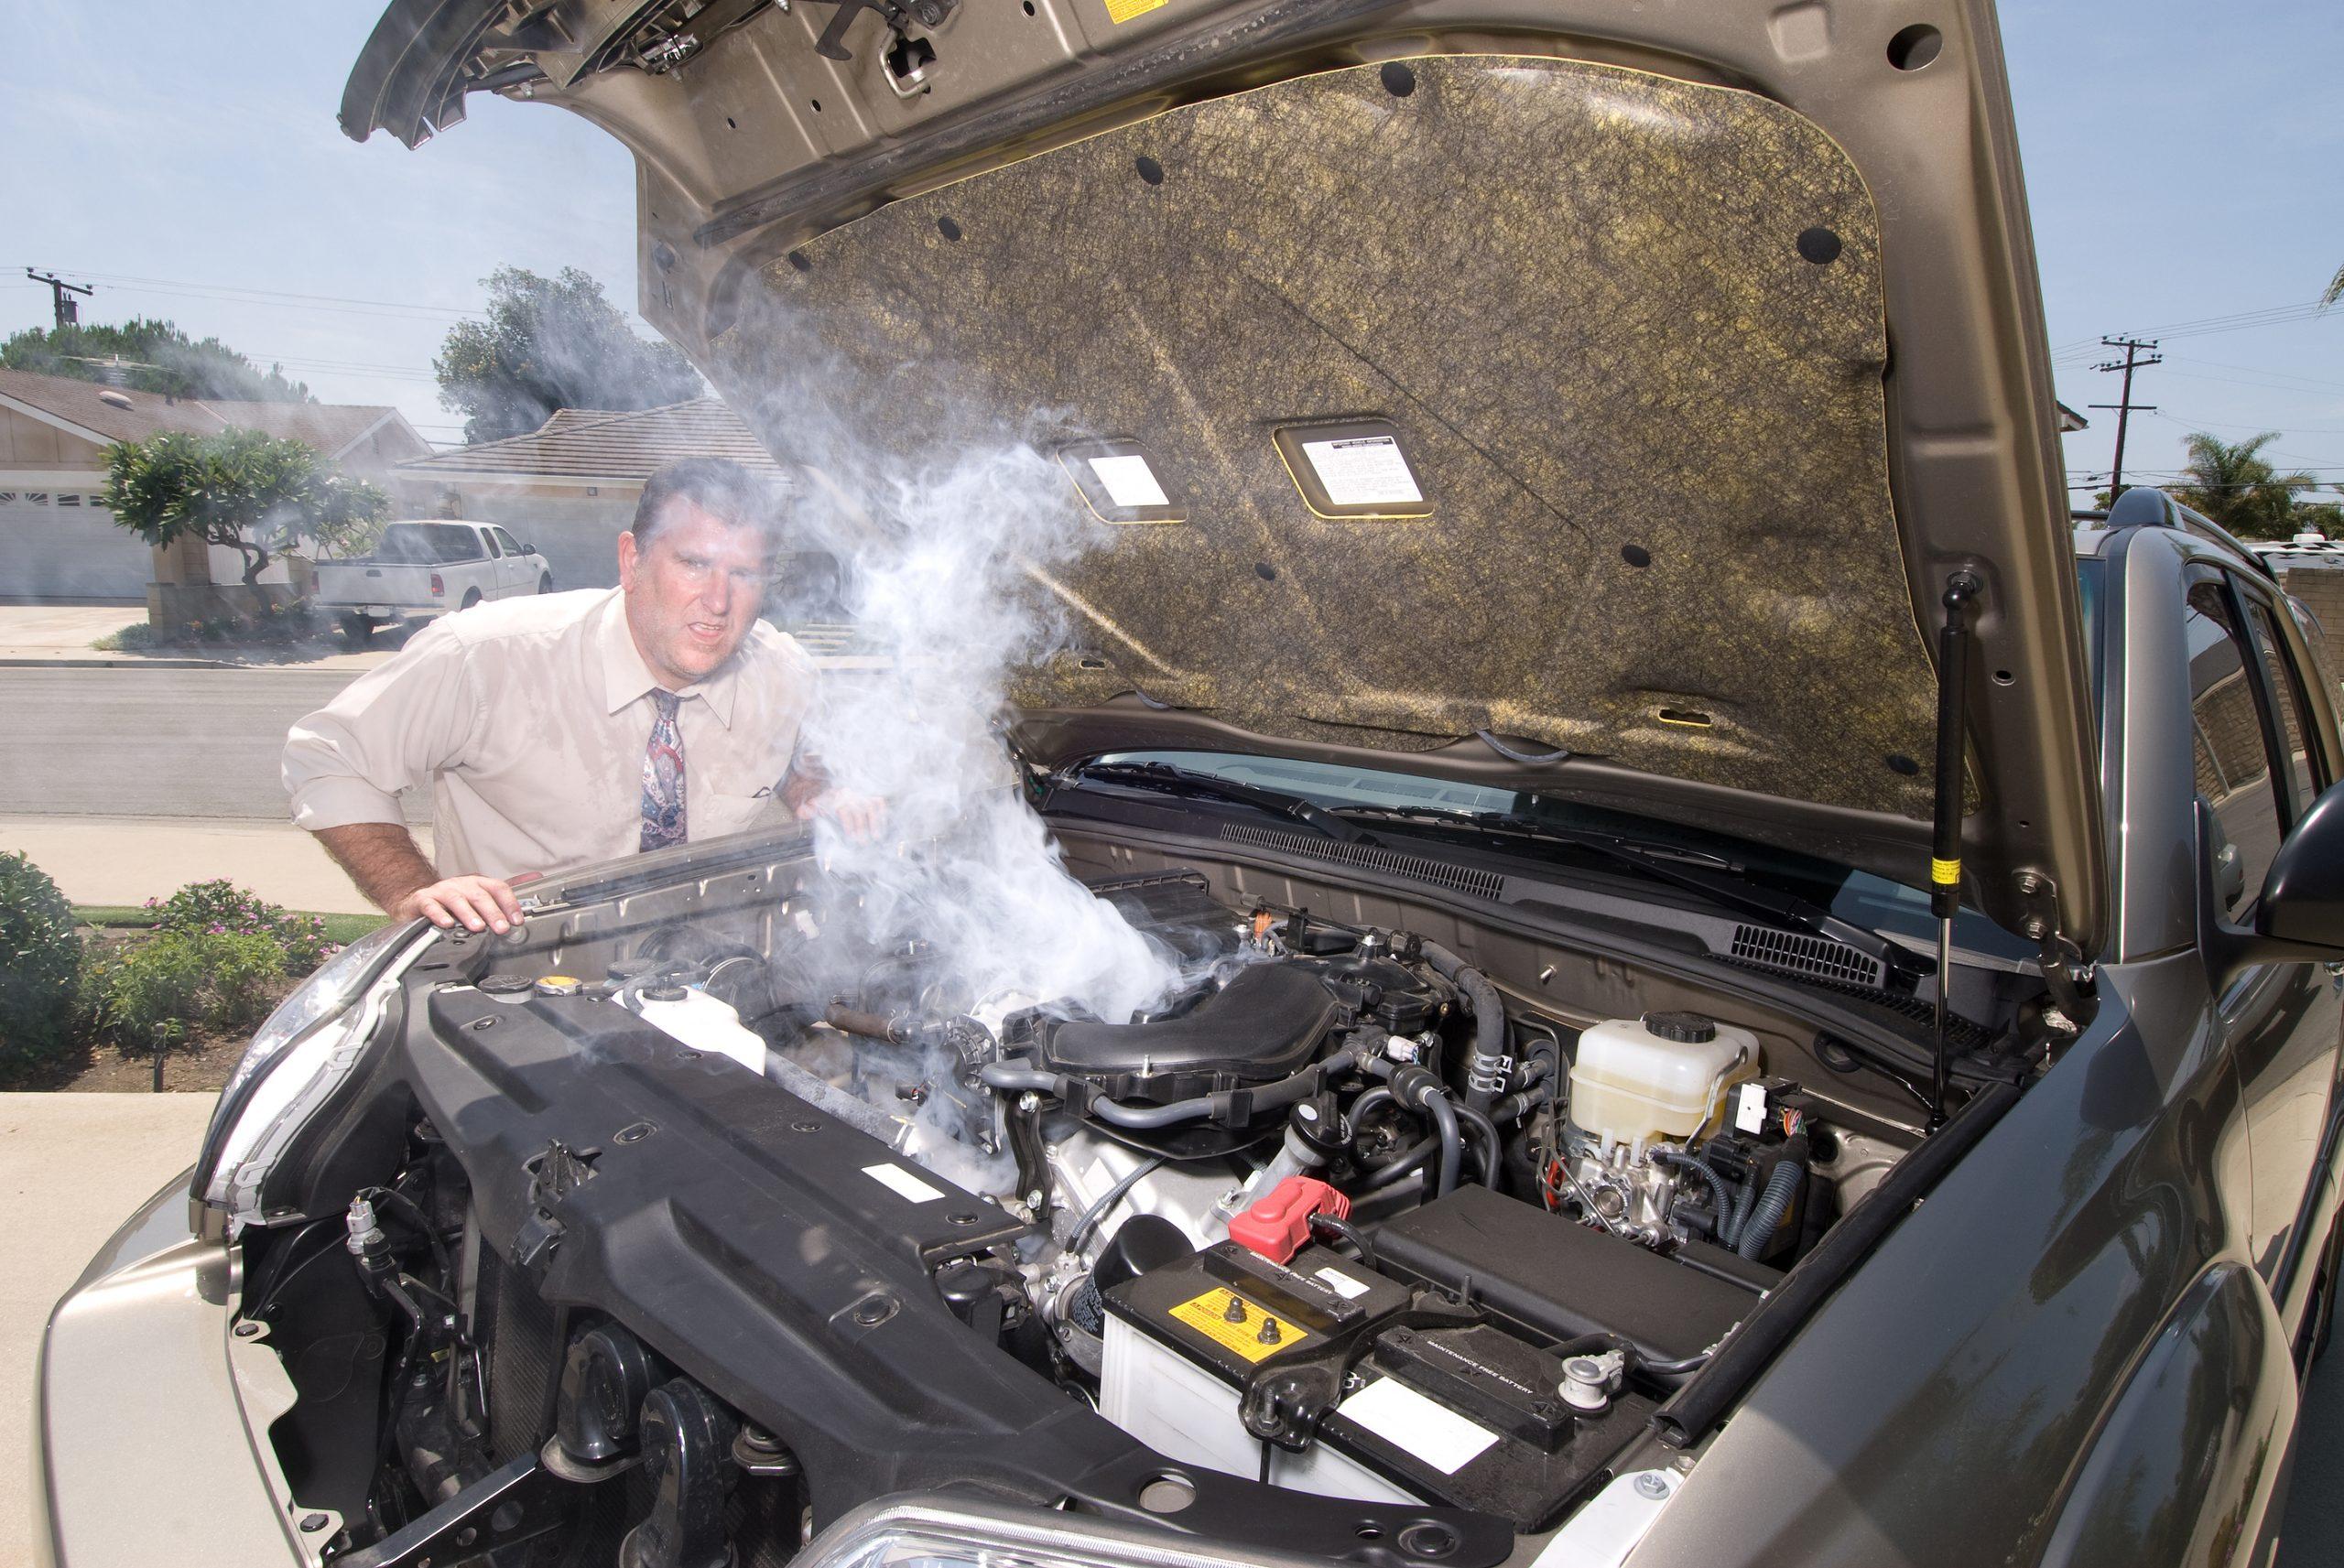 How Long Can A Car Run Hot Before Damage?